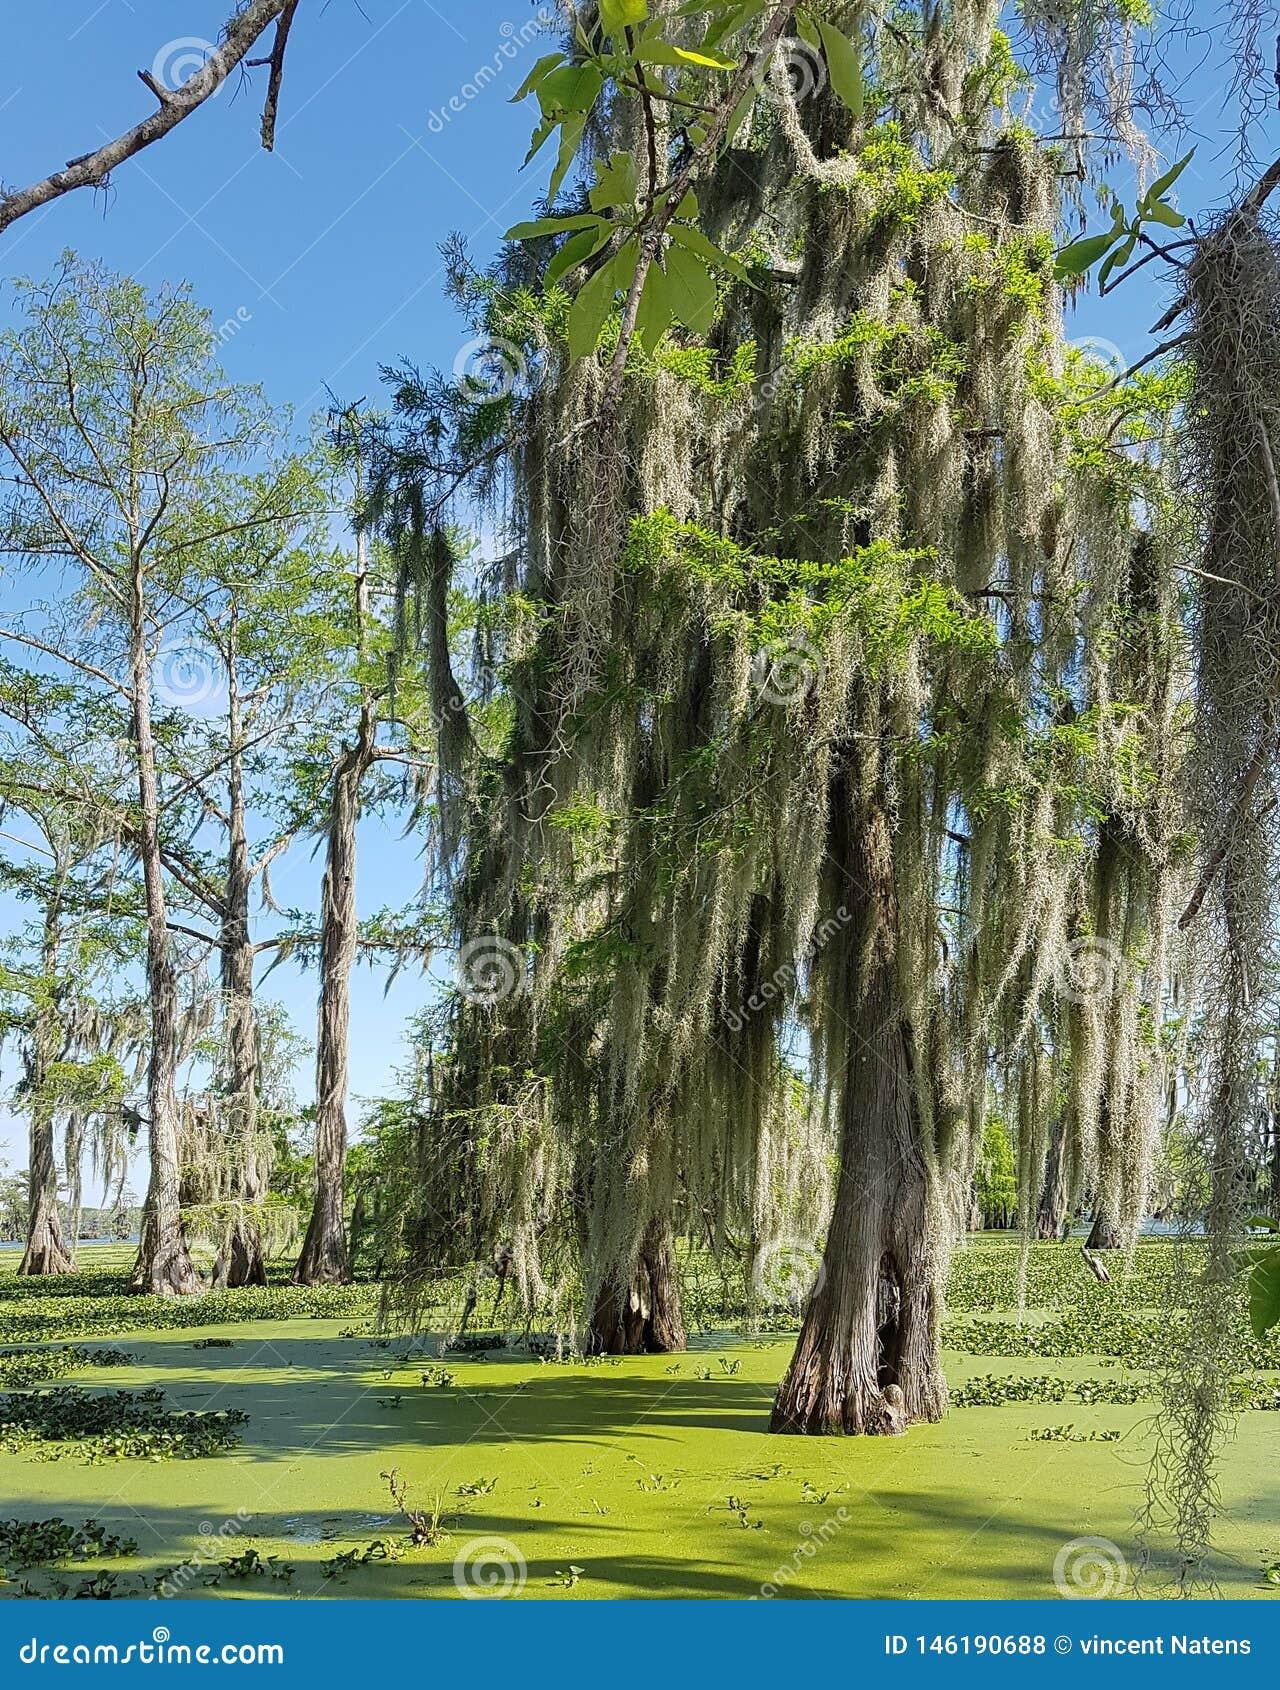 Louisiana-Sumpfausflug